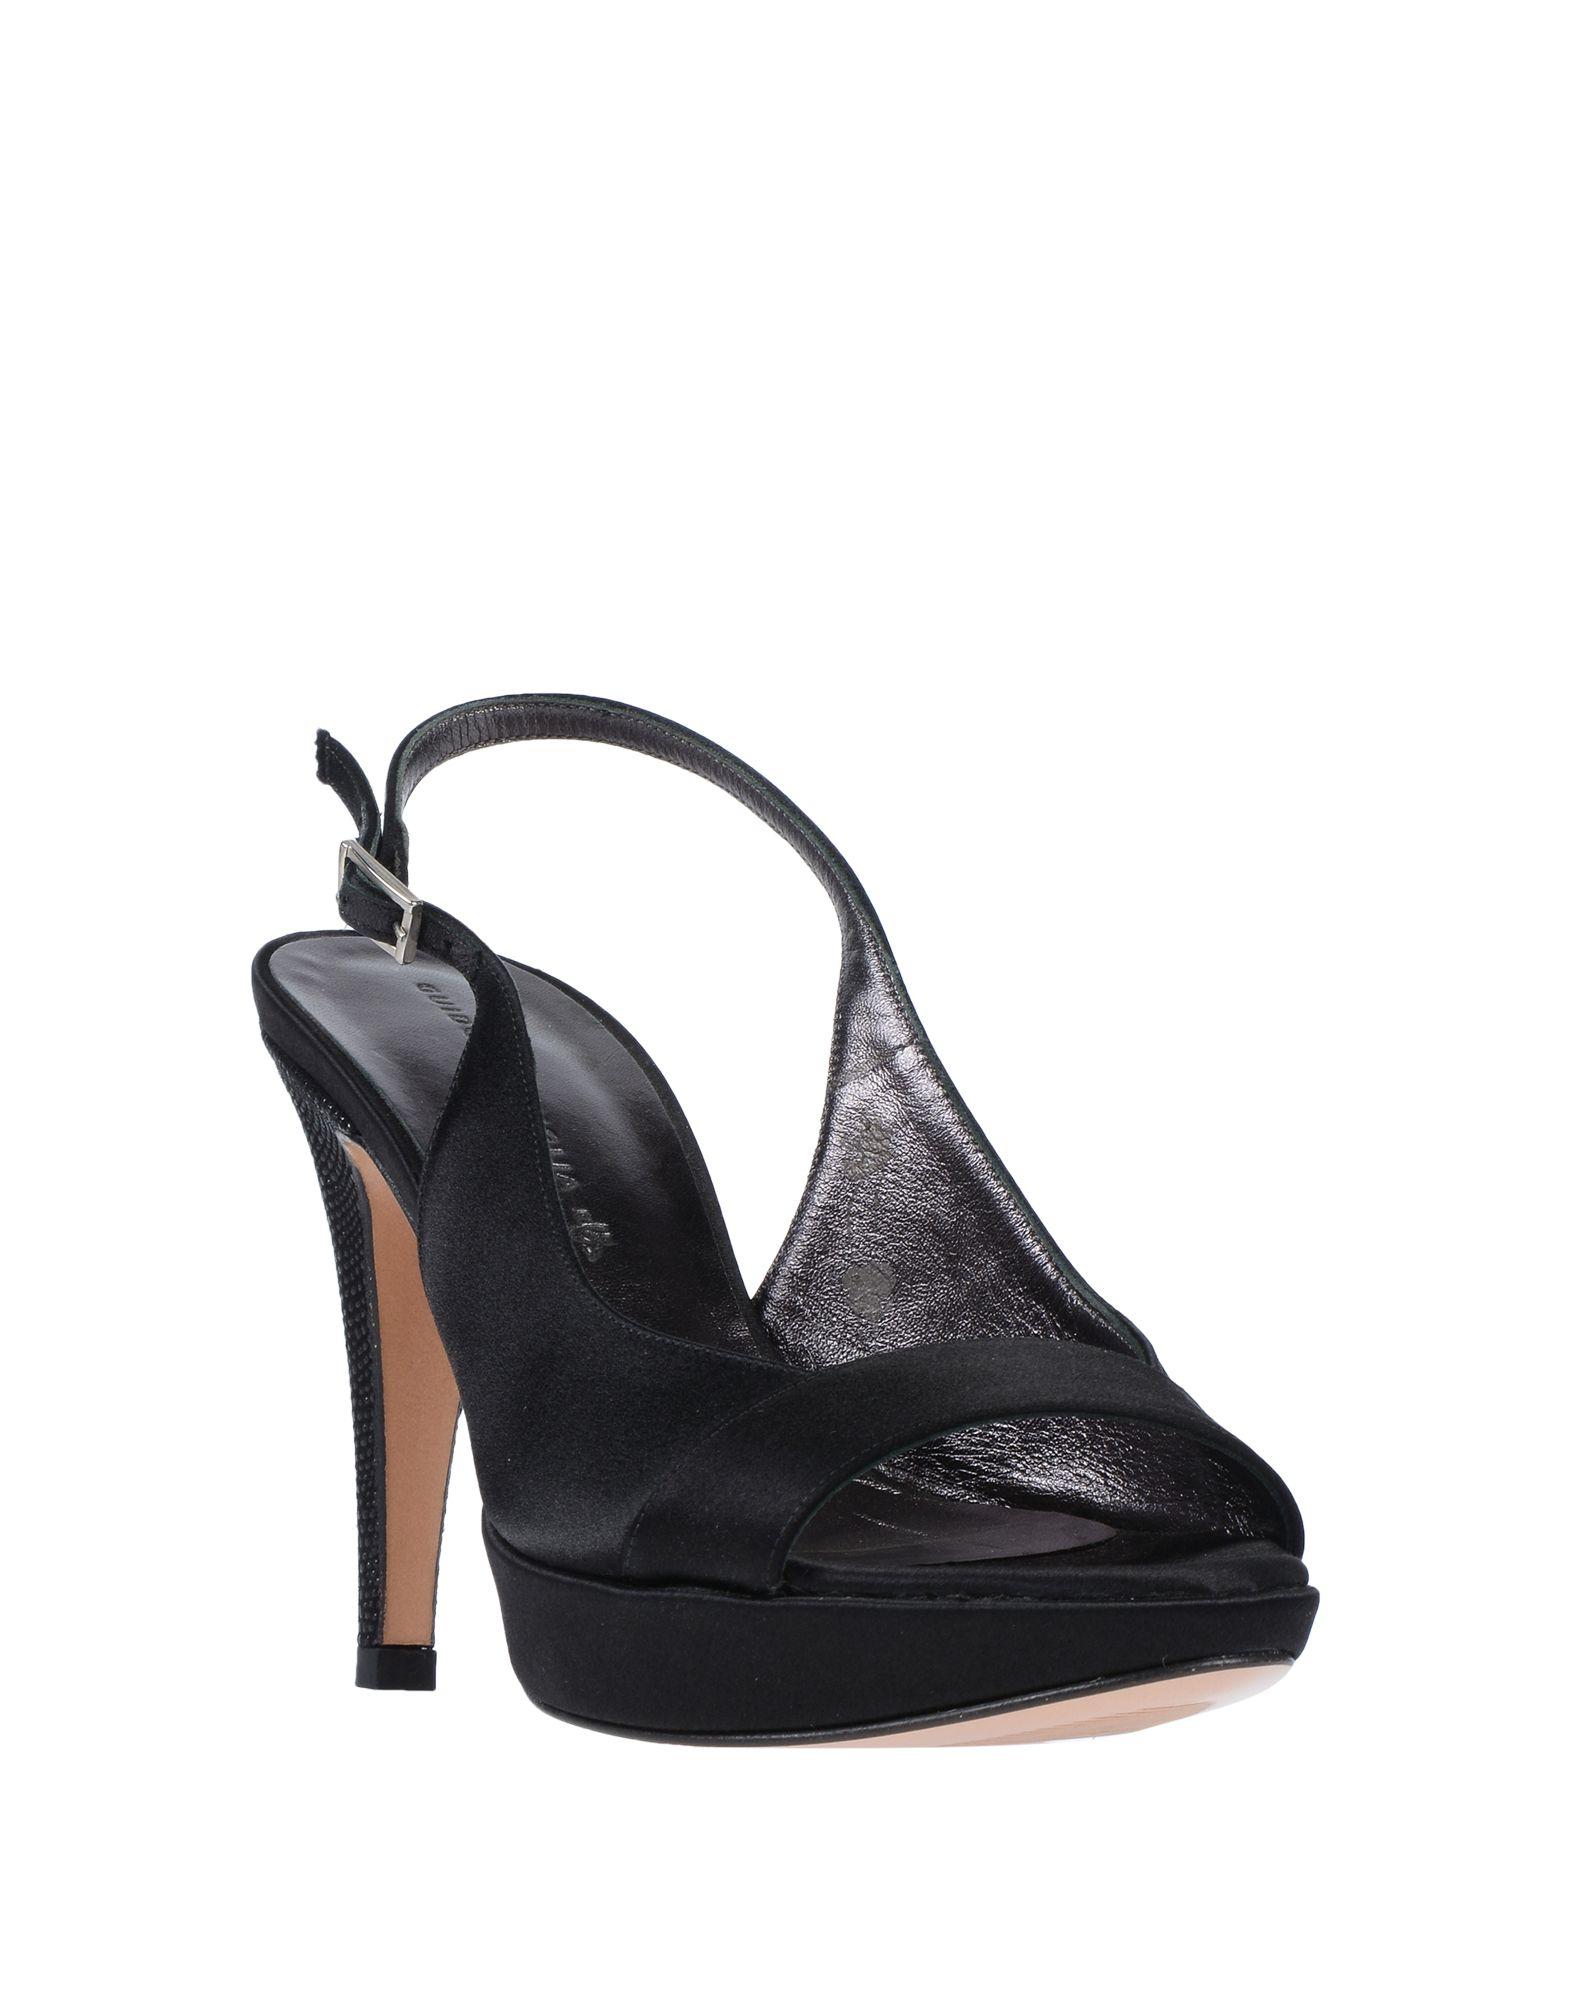 Stilvolle billige Schuhe Guido 11525120TF Sgariglia Sandalen Damen  11525120TF Guido 1f2770